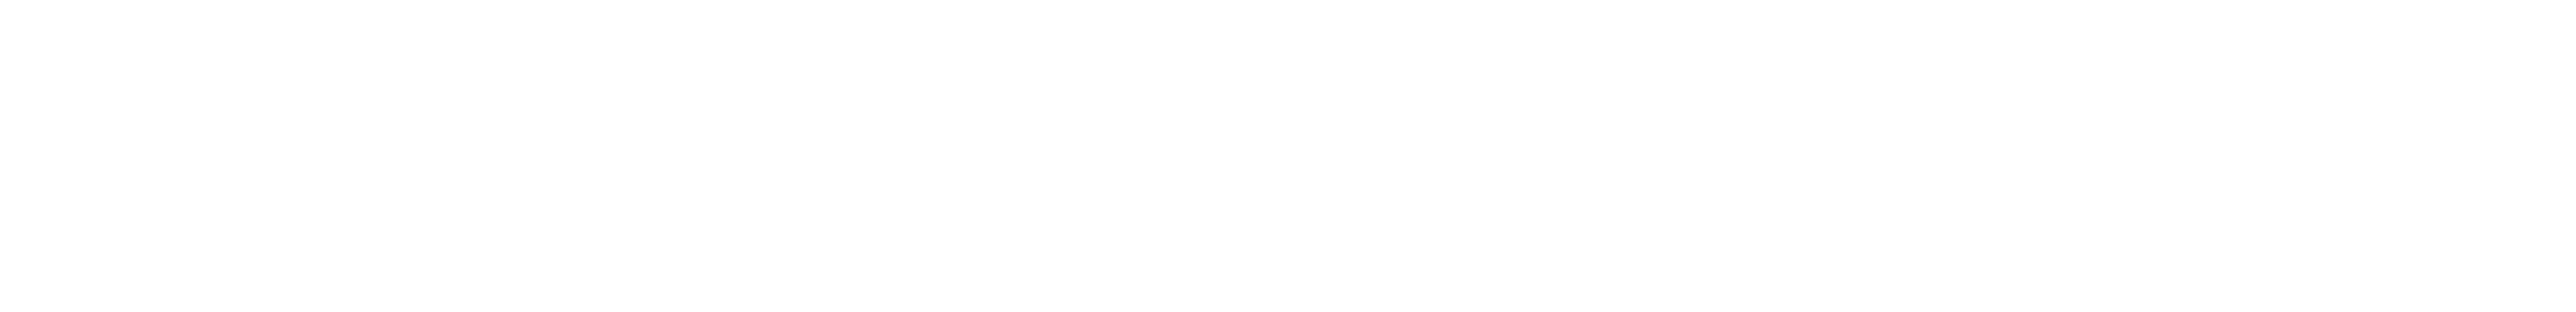 Bord Cadre logo blanc